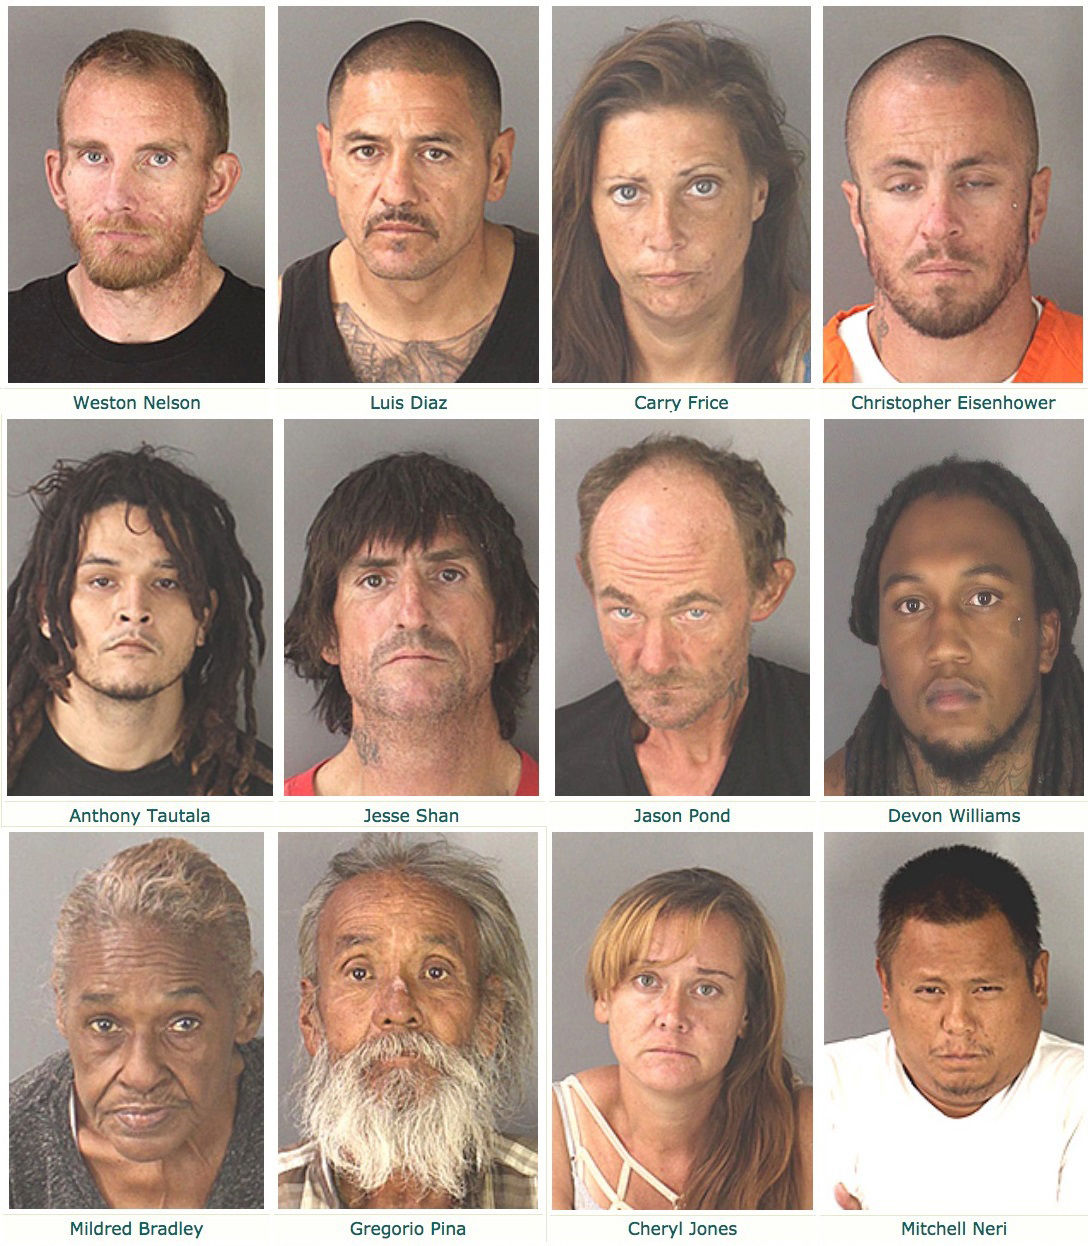 'Zero Tolerance' – Mass sweep nets 37 arrests: Area Sheriff's Dept., BPD, CHP lead Palo Verde Valley operation